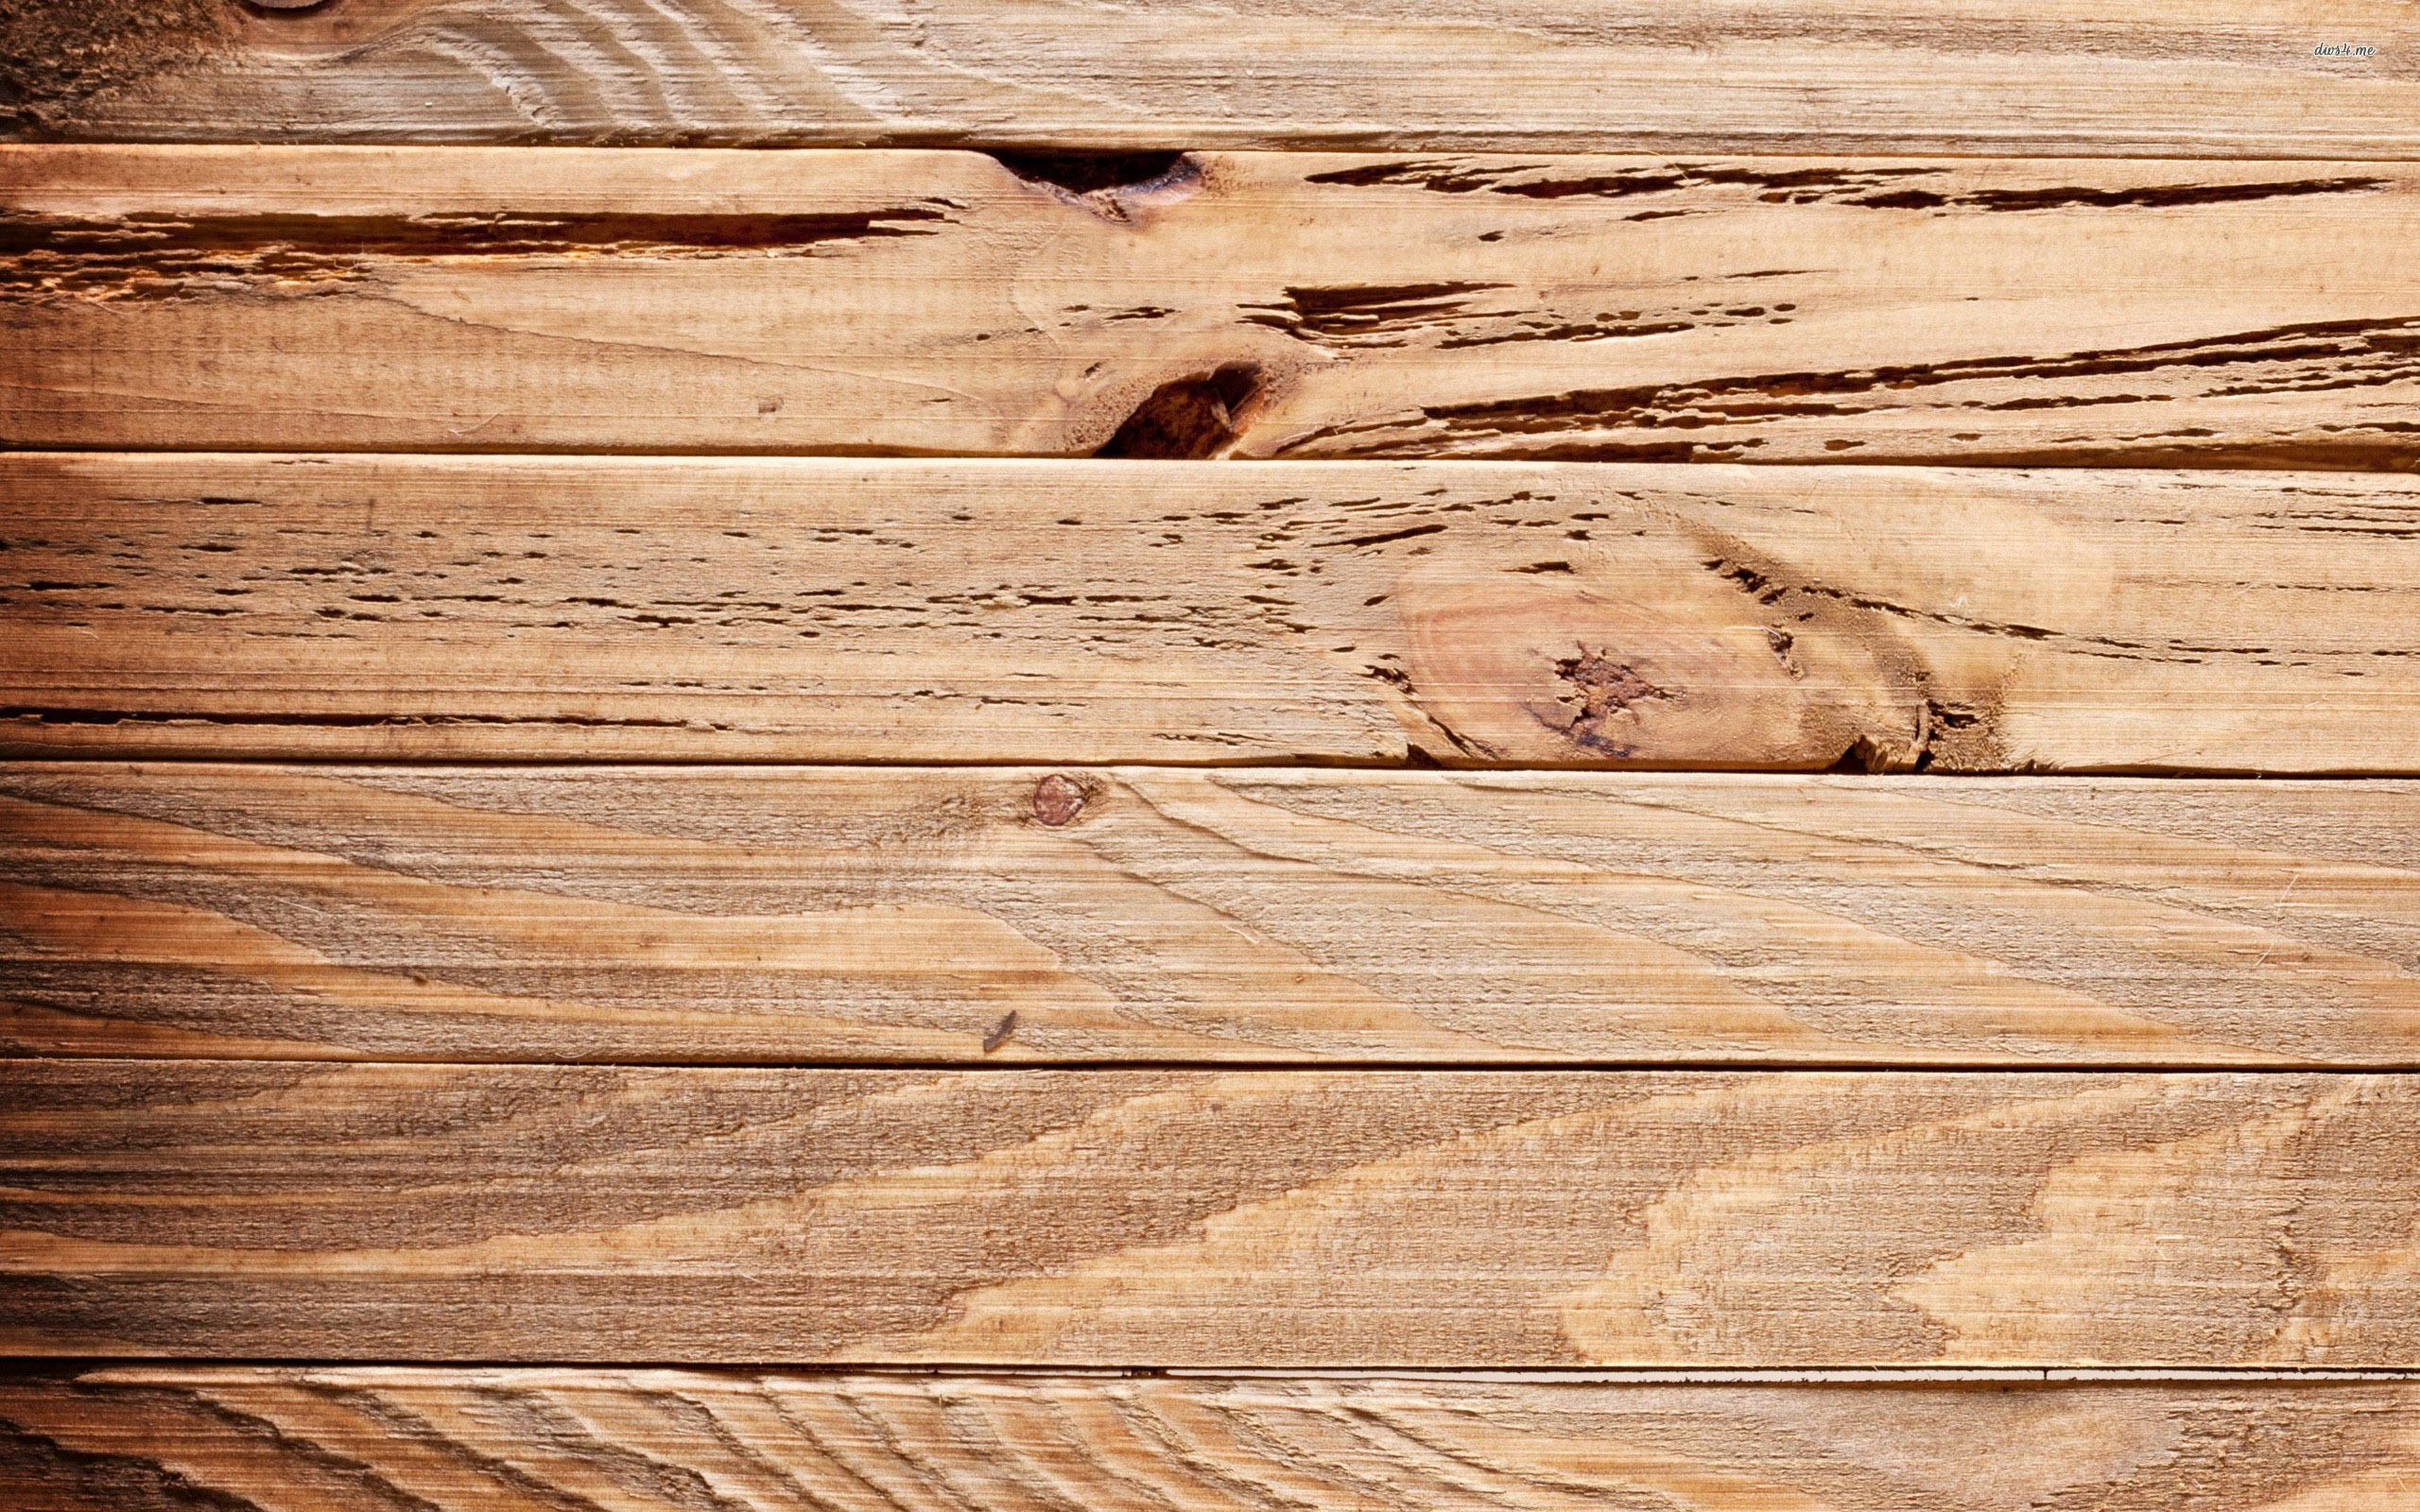 Wood Wallpaper Sdeerwallpaper Wow o